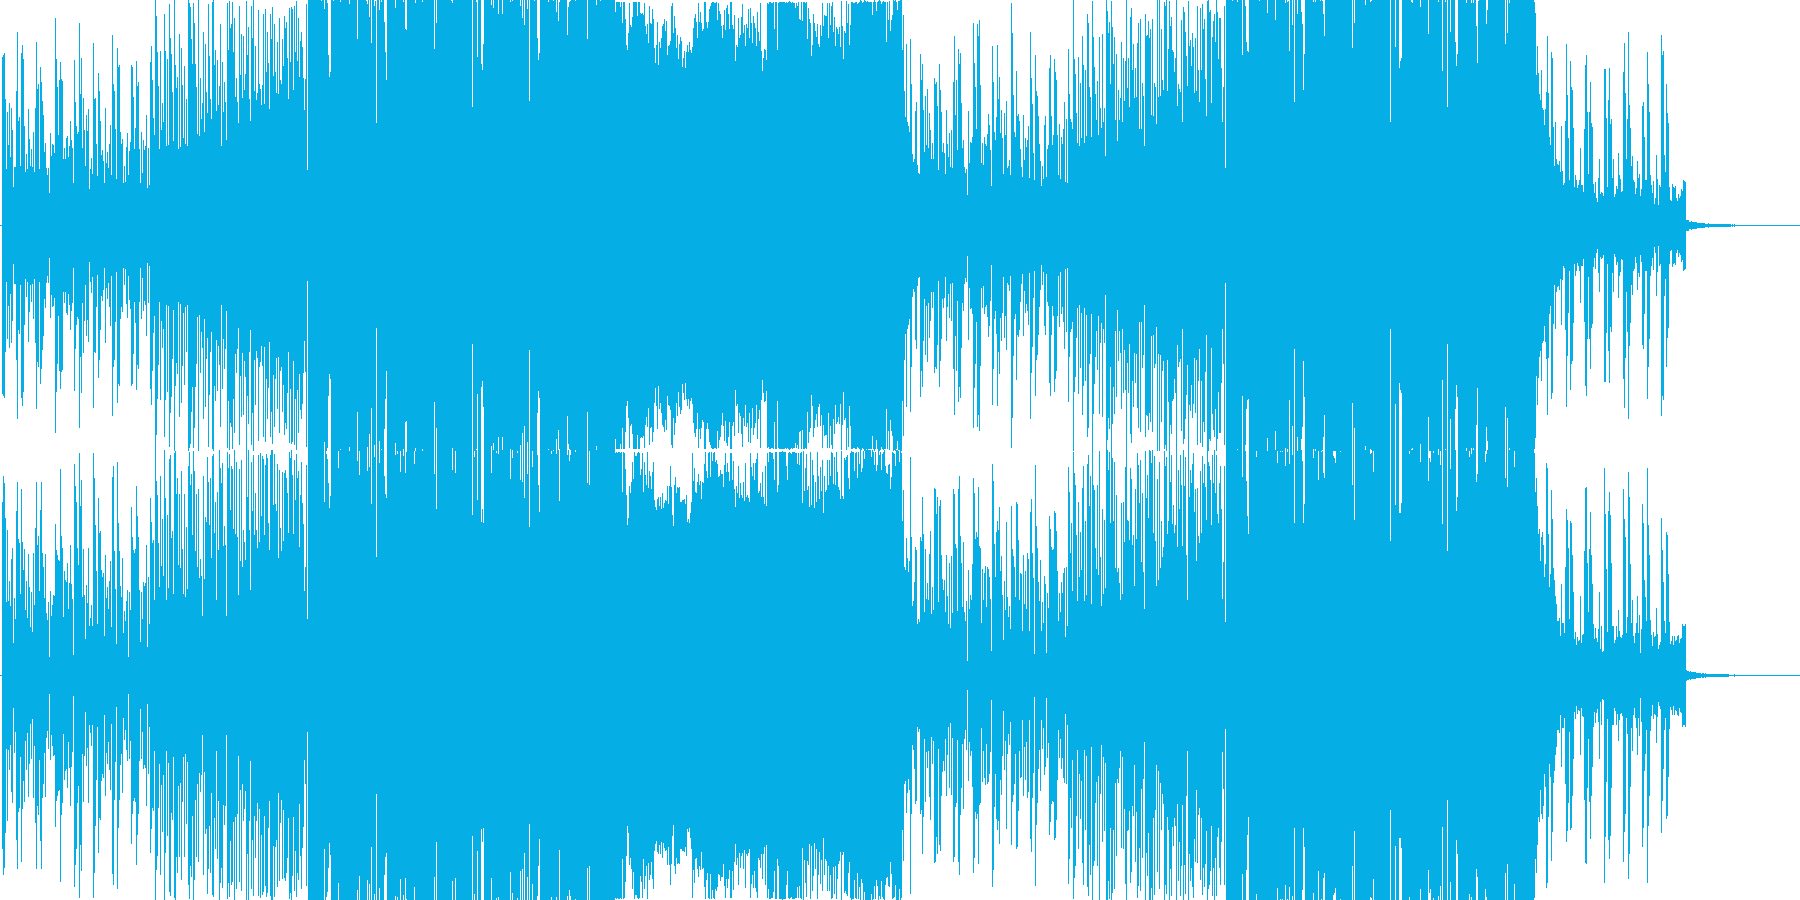 8bitロマンス/ フューチャーベースの再生済みの波形